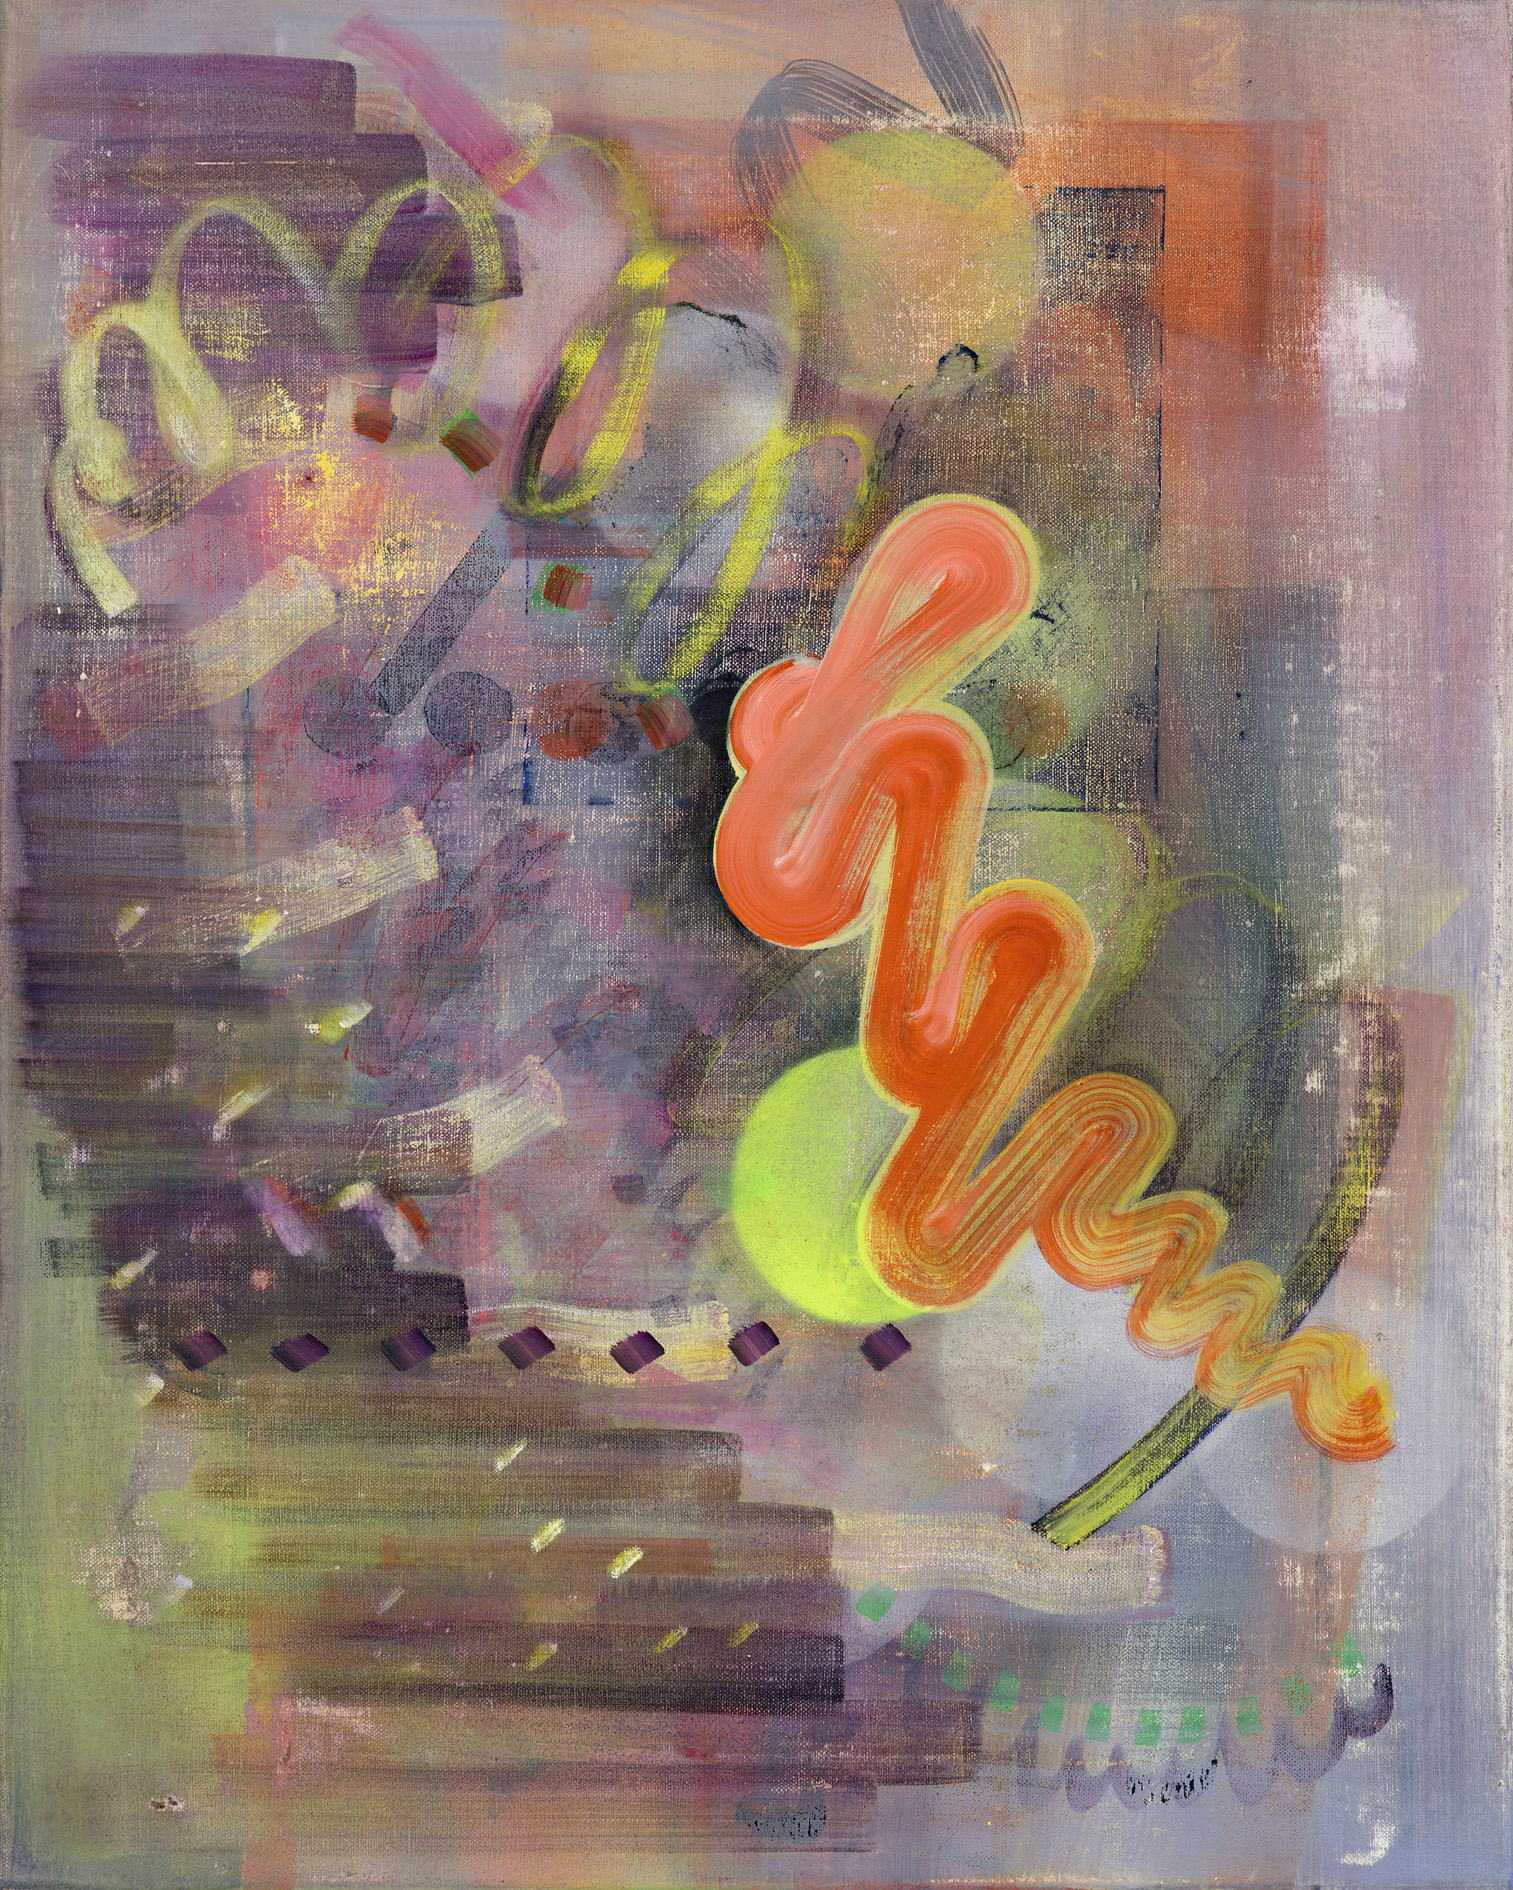 Untitled 20, oil on linen, 50cm x 40cm, 2017